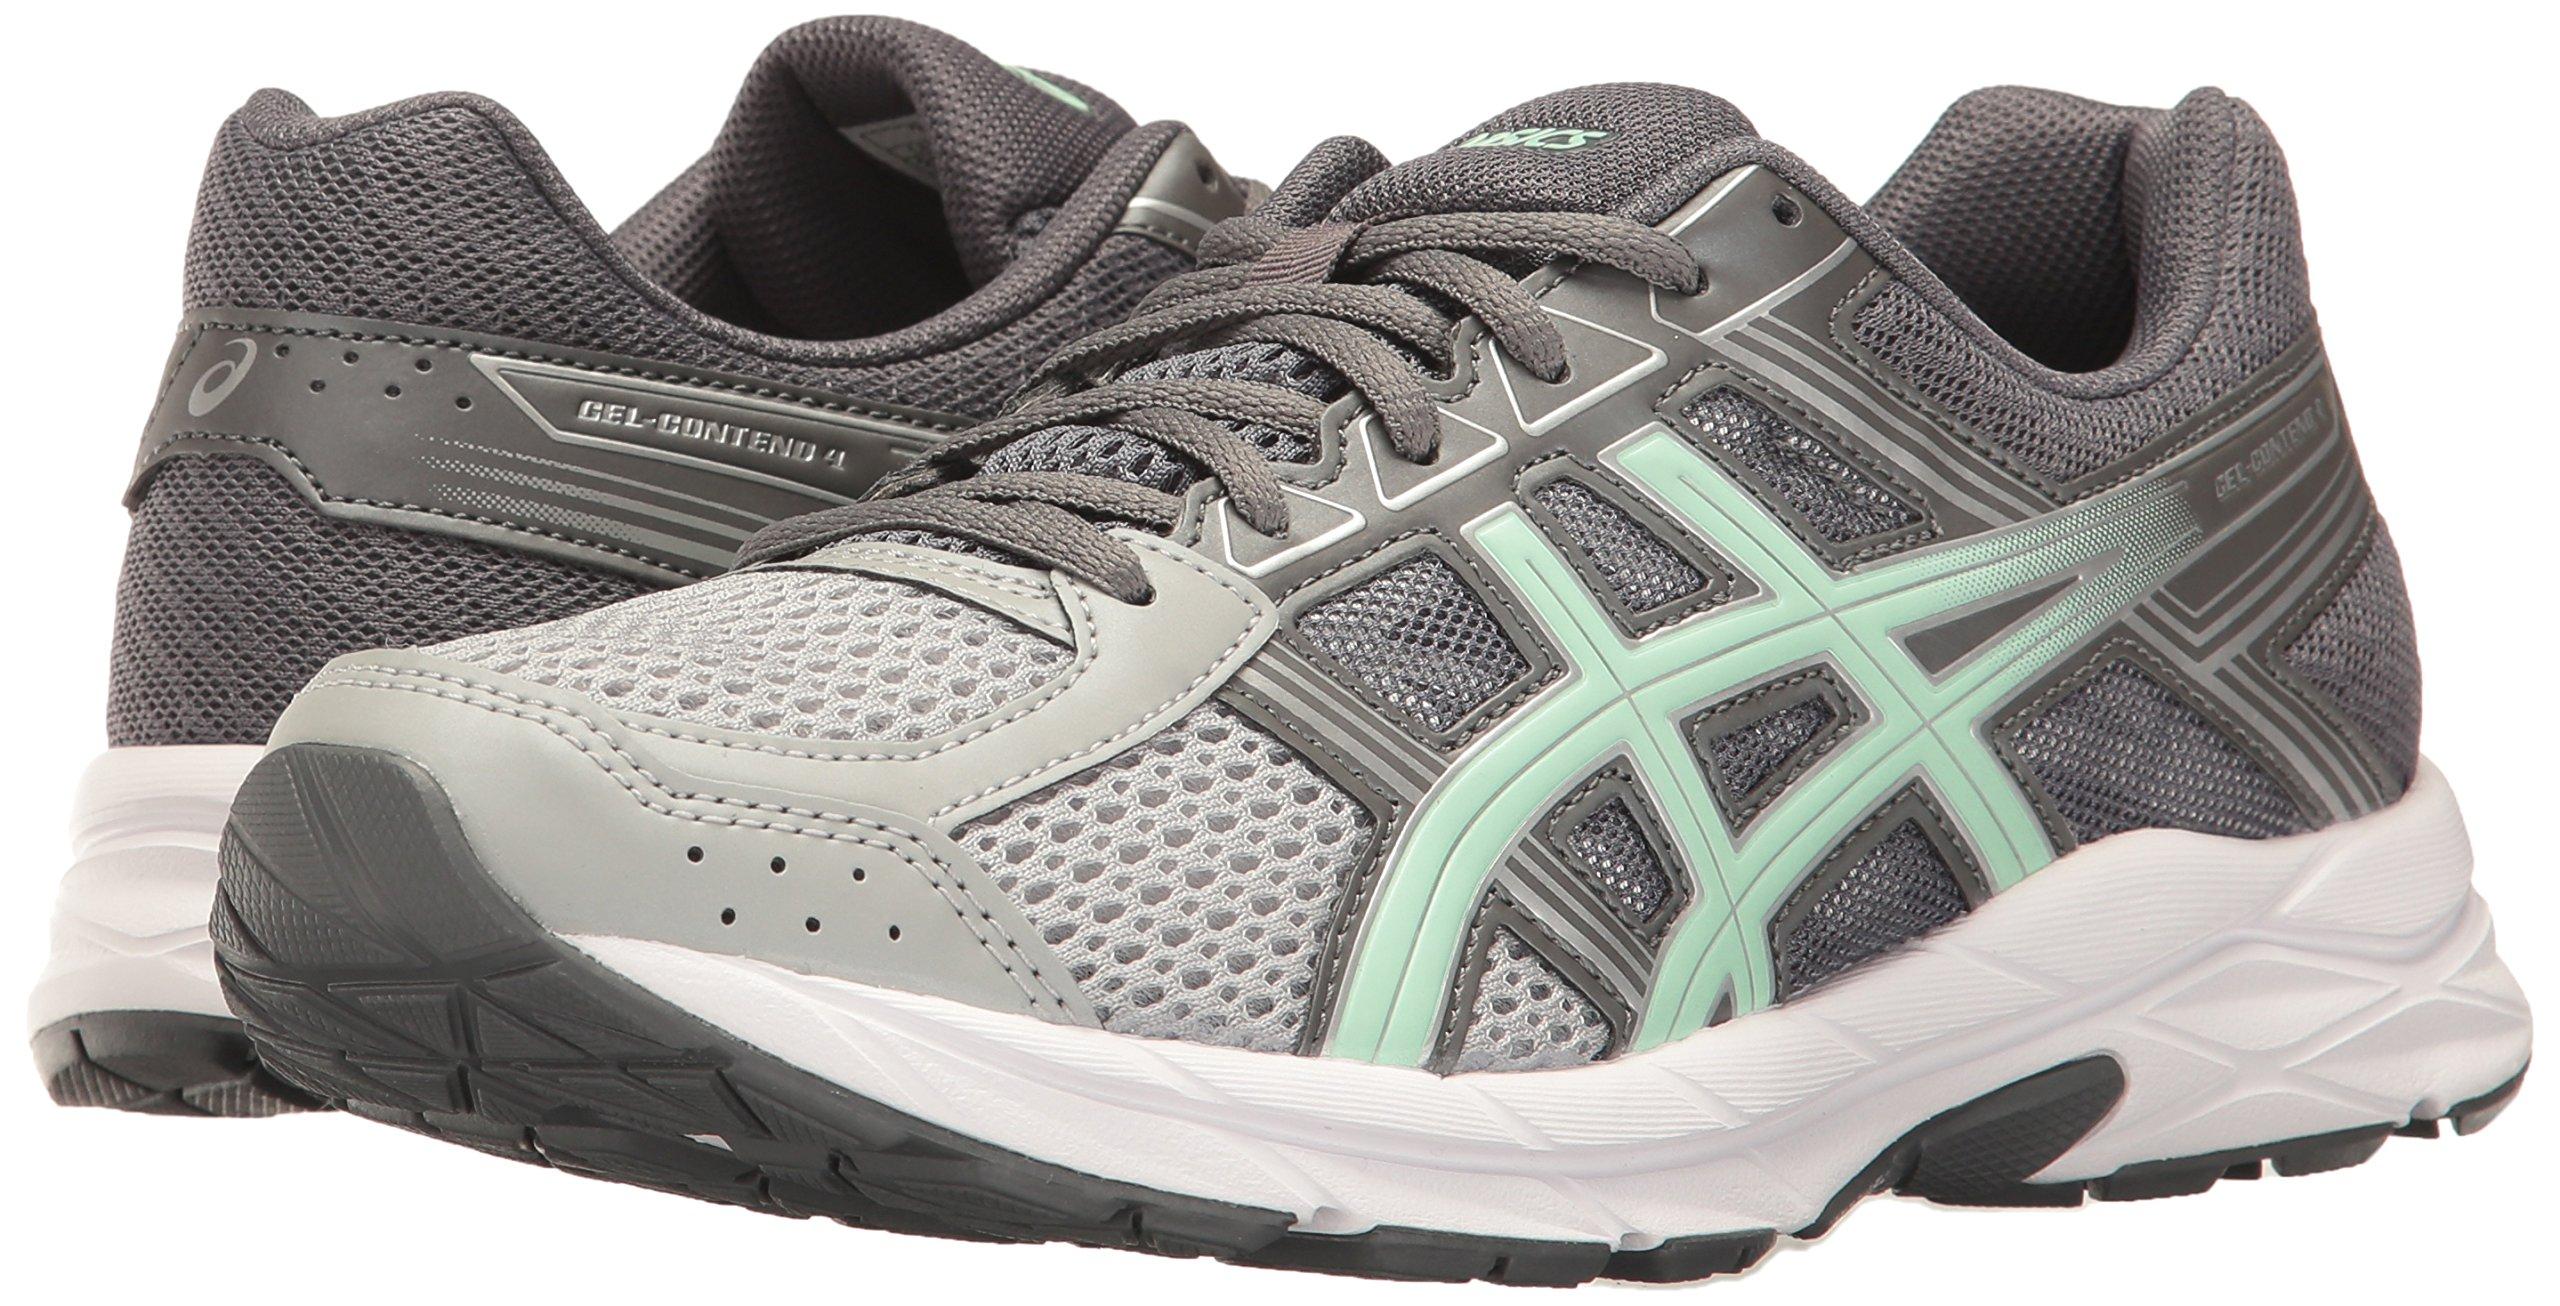 ASICS Womens Gel-Contend 4 Running Shoe, Mid Grey/Glacier Sea/Silver, 5 Medium US by ASICS (Image #6)